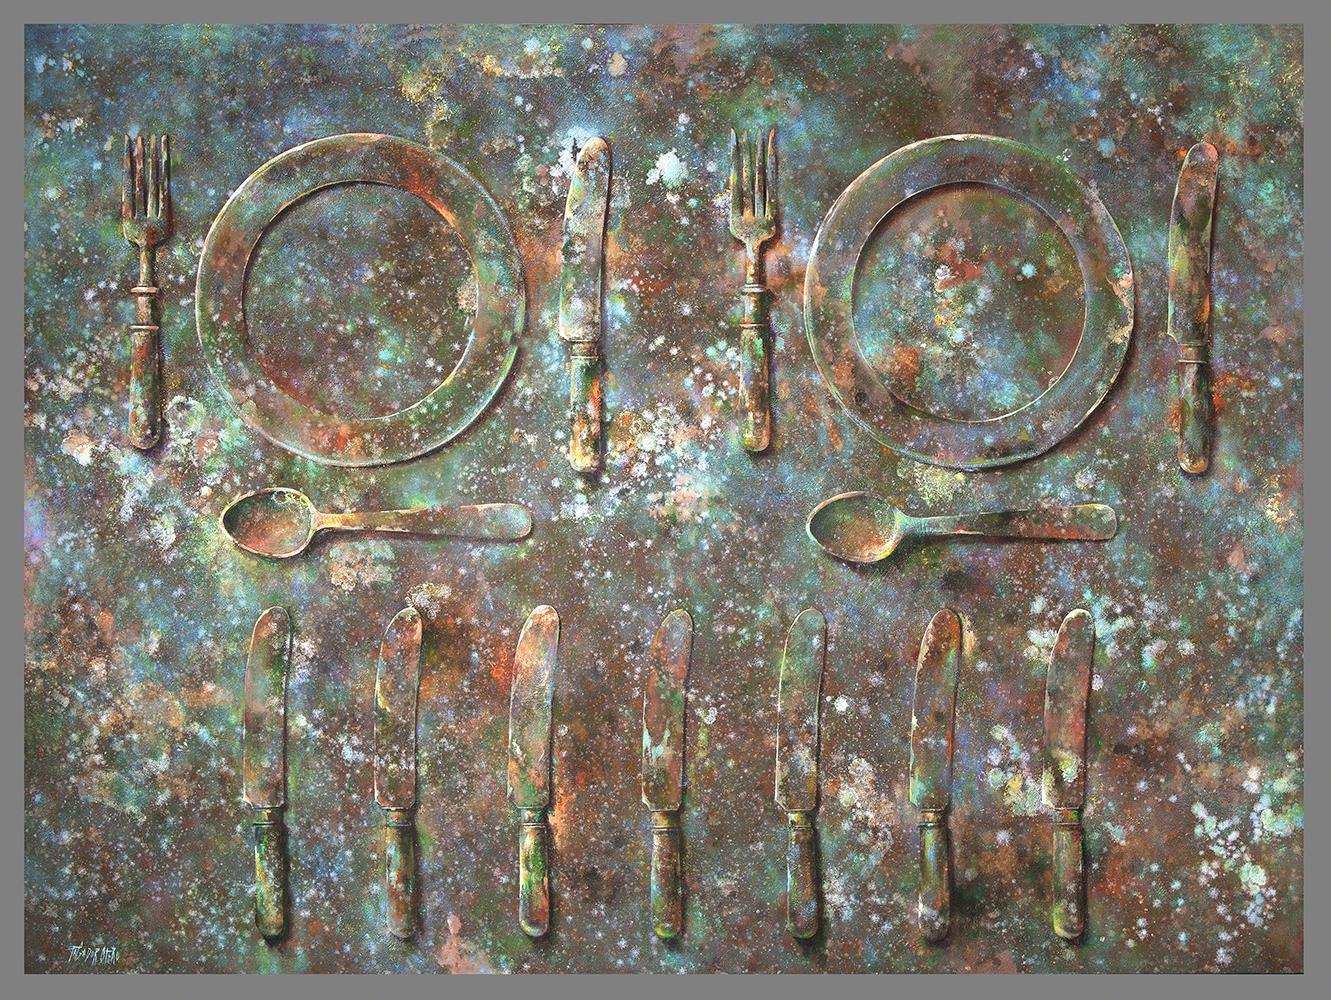 SIETE SON SIETE - Mx/Lz - 143x195 cm - 2015 - Gata de Gorgos.